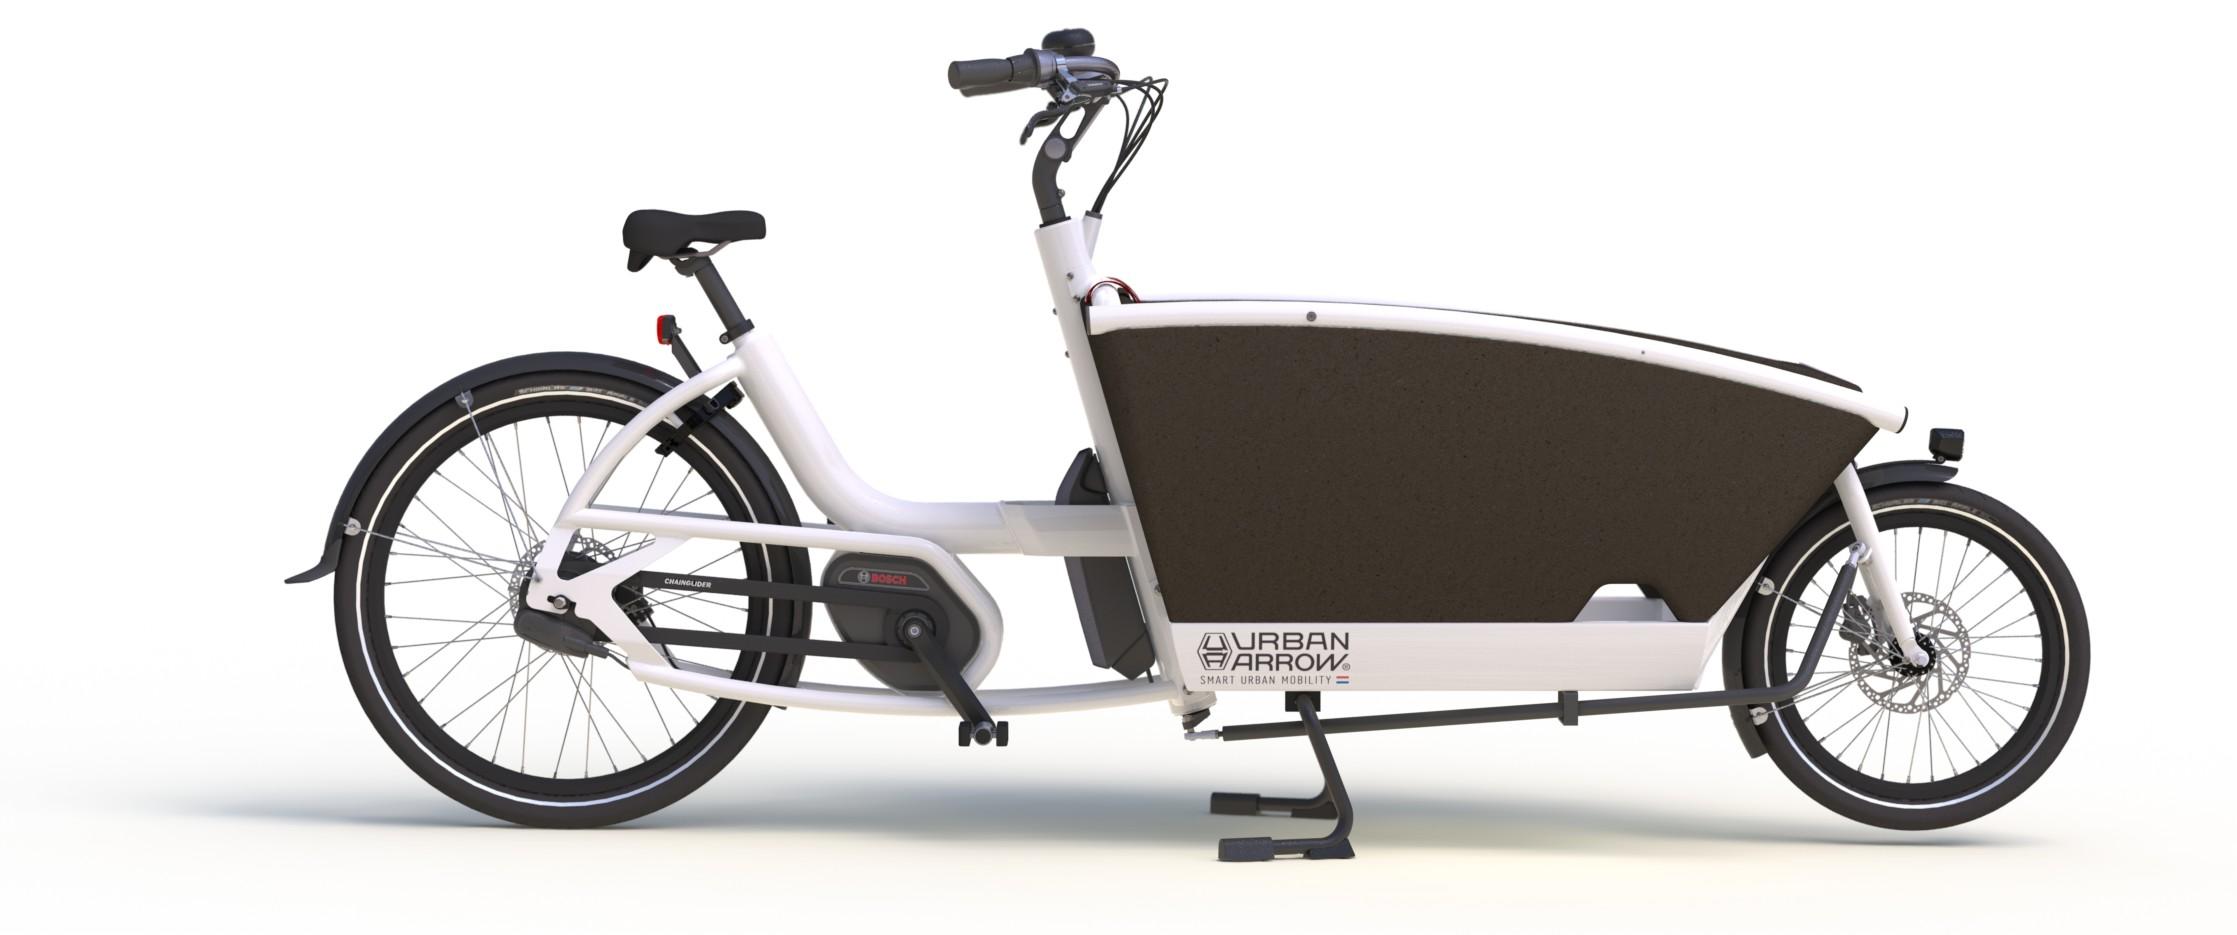 urban-arrow-cargo-bike-family-version